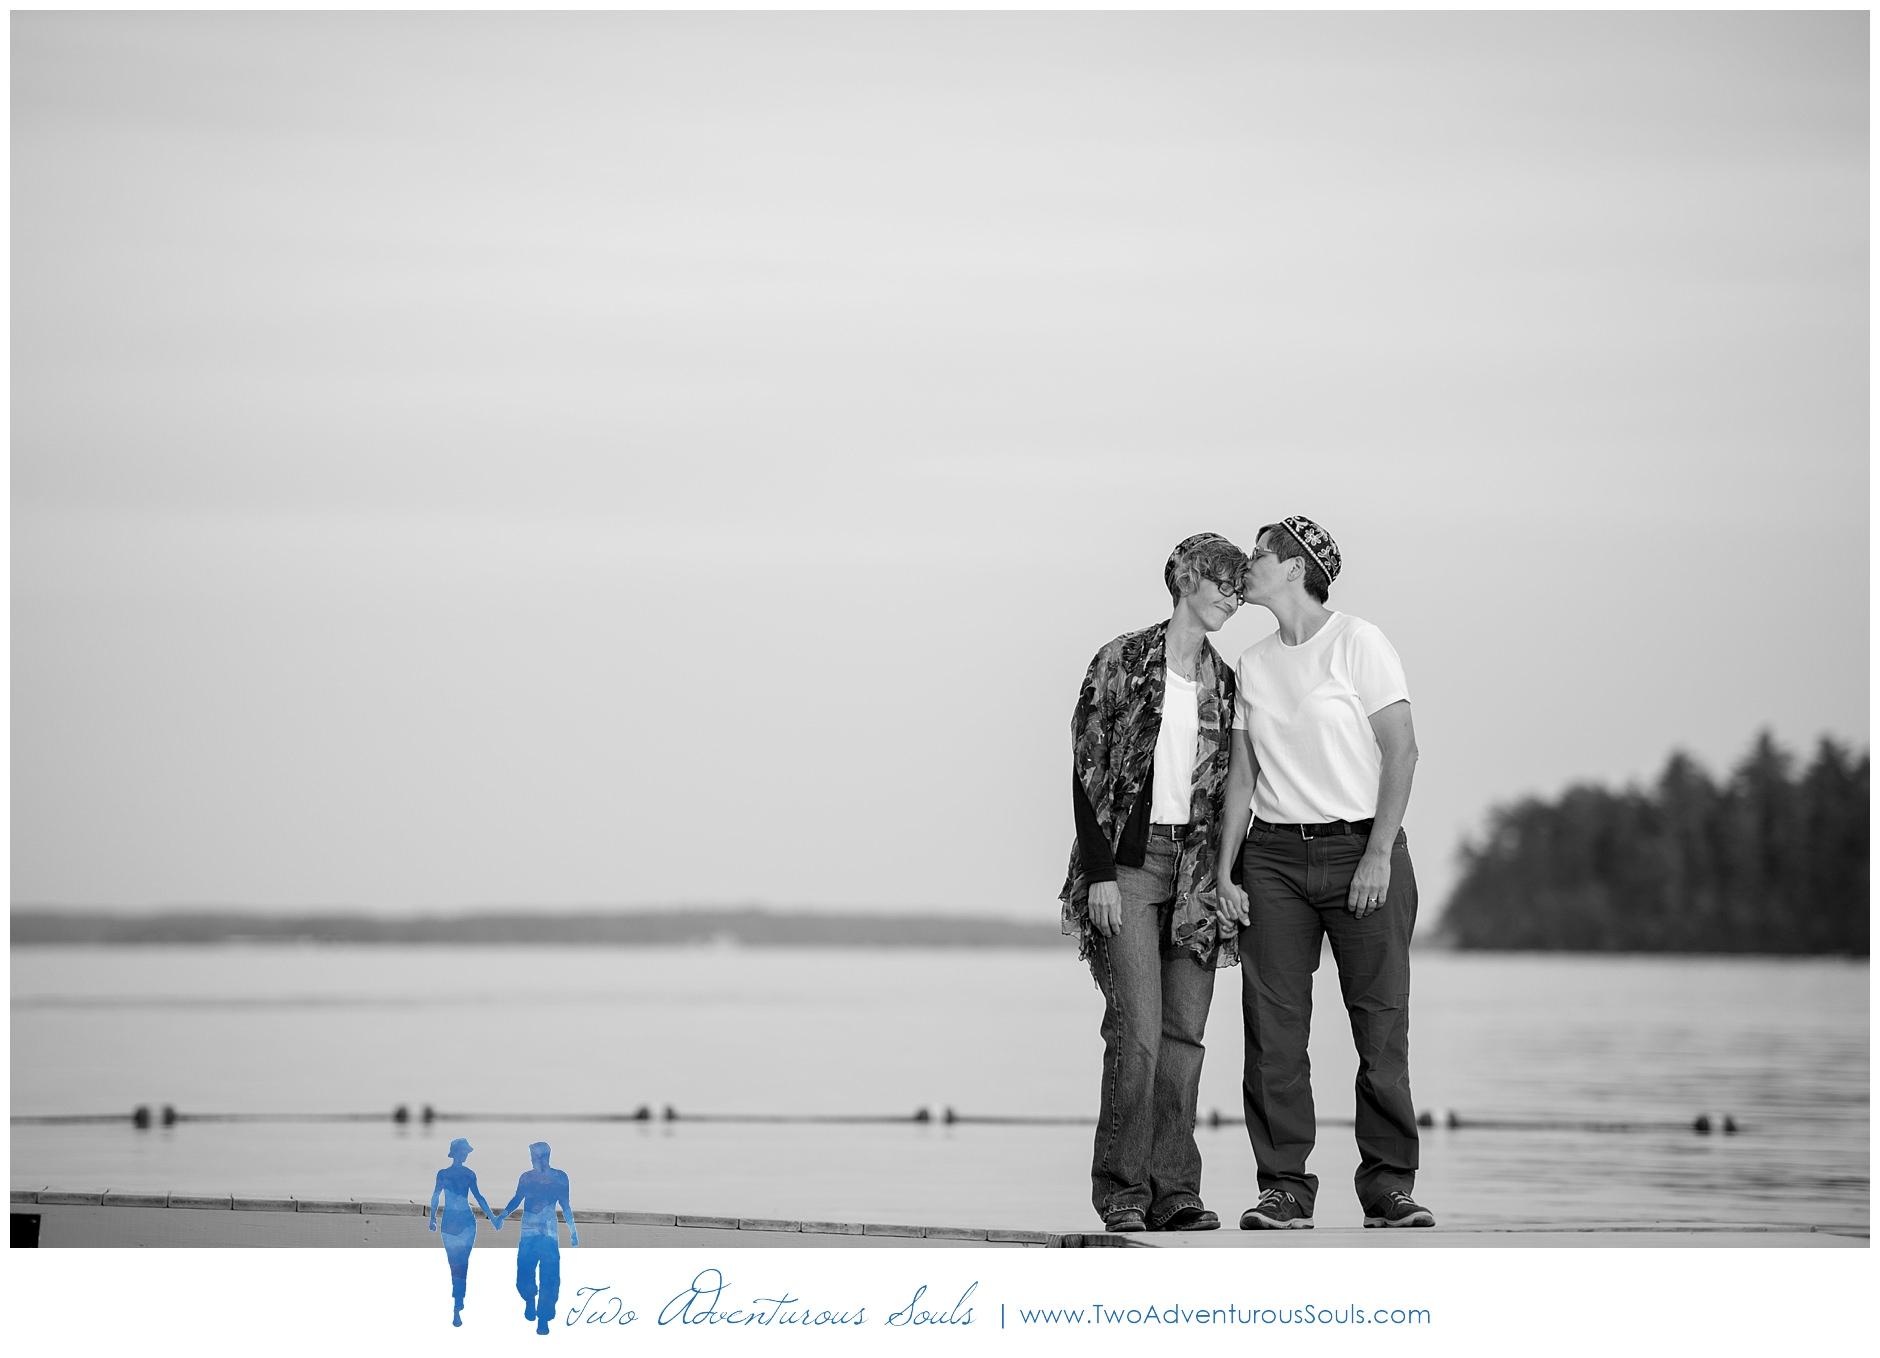 090217-Mindy-Karen-sneaks-79_WEB-Maine-Wedding-and-Portrait-Photographer.jpg